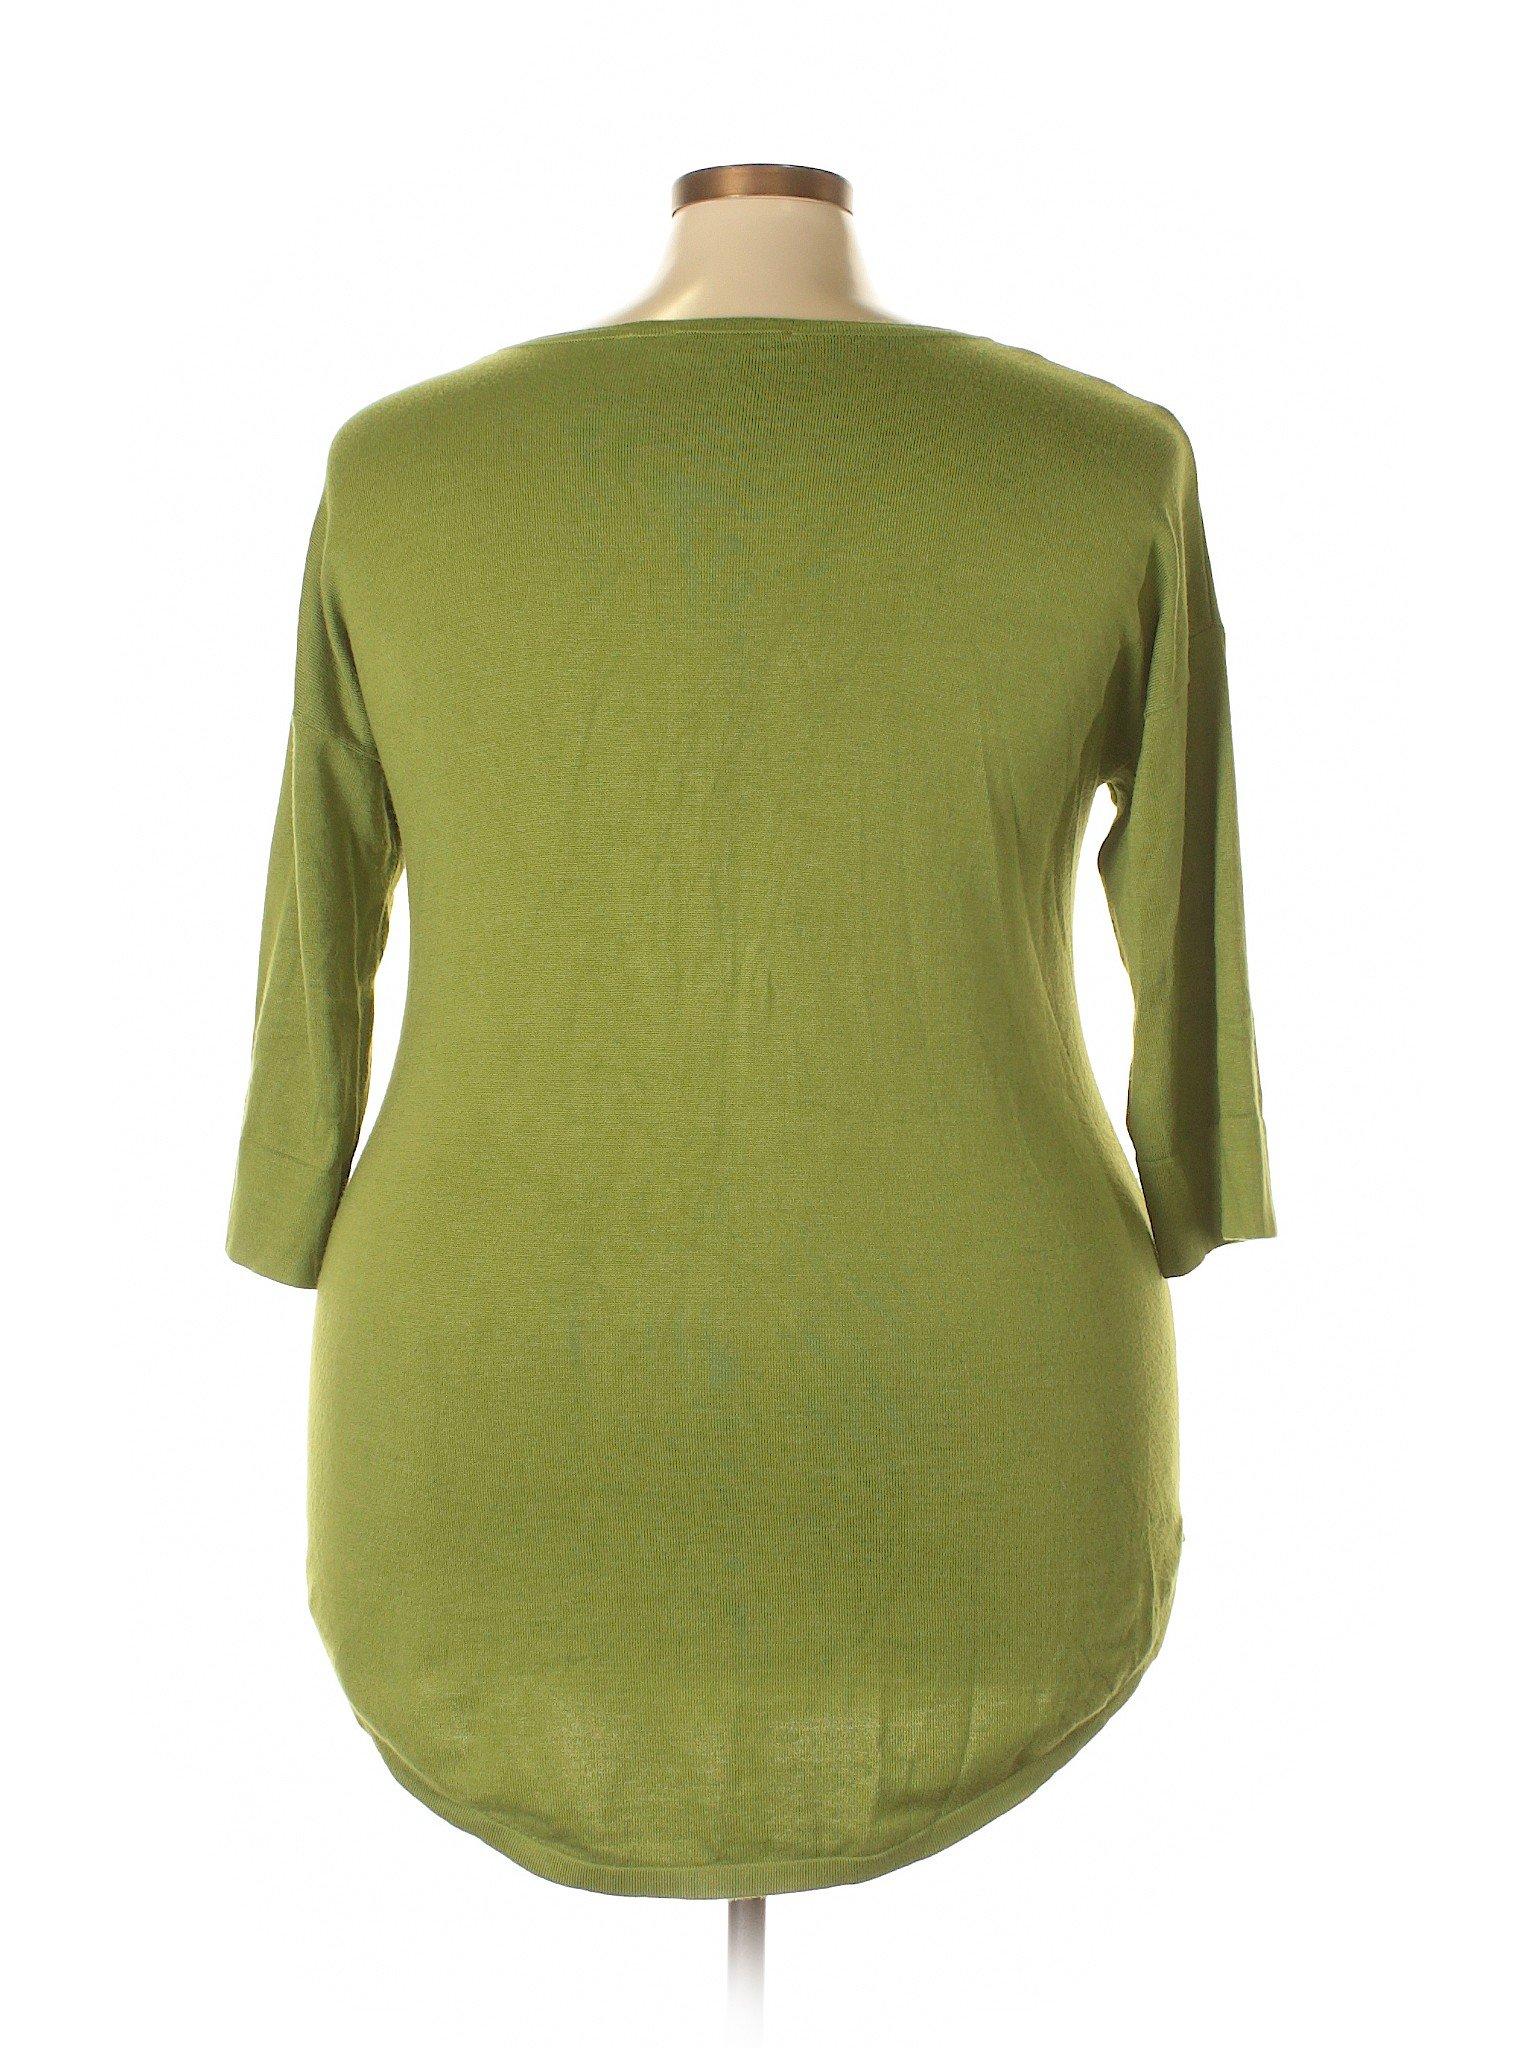 Pullover Pullover Boutique Sweater Boutique Sweater Cyrus Boutique Cyrus PdxzPY